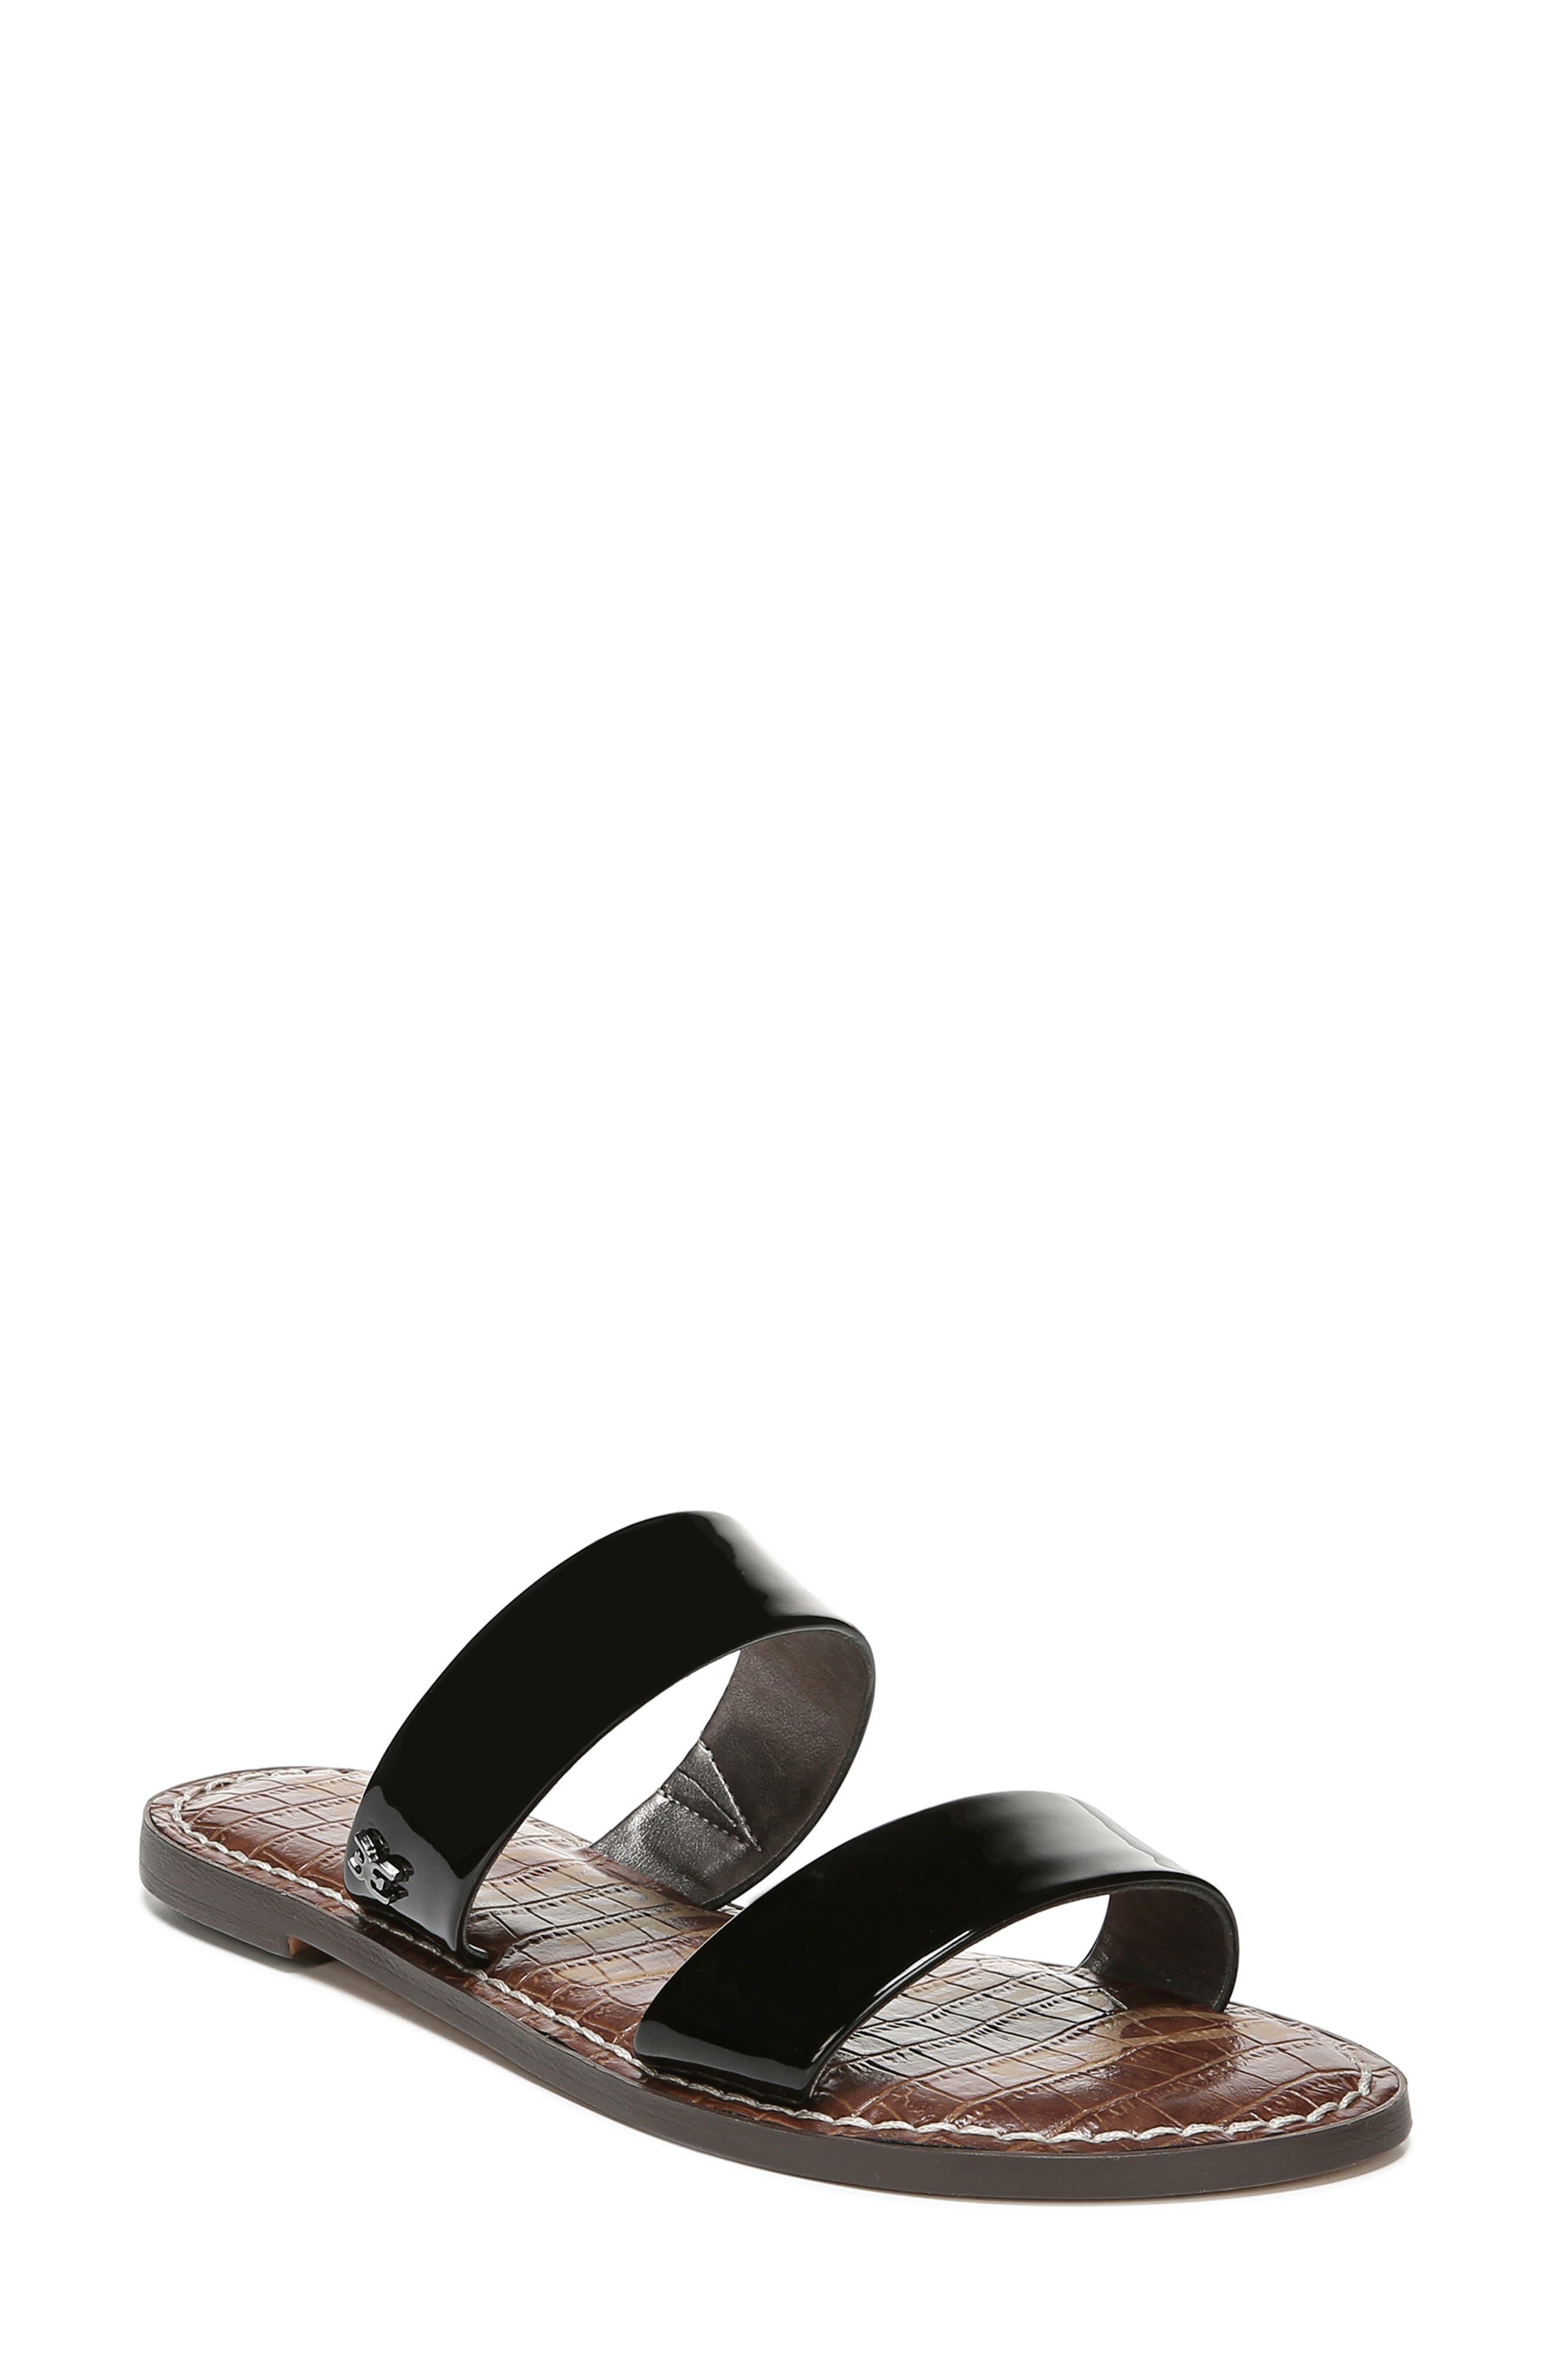 SAM EDELMAN Gala Two Strap Slide Sandal, Main, color, BLACK FAUX PATENT LEATHER